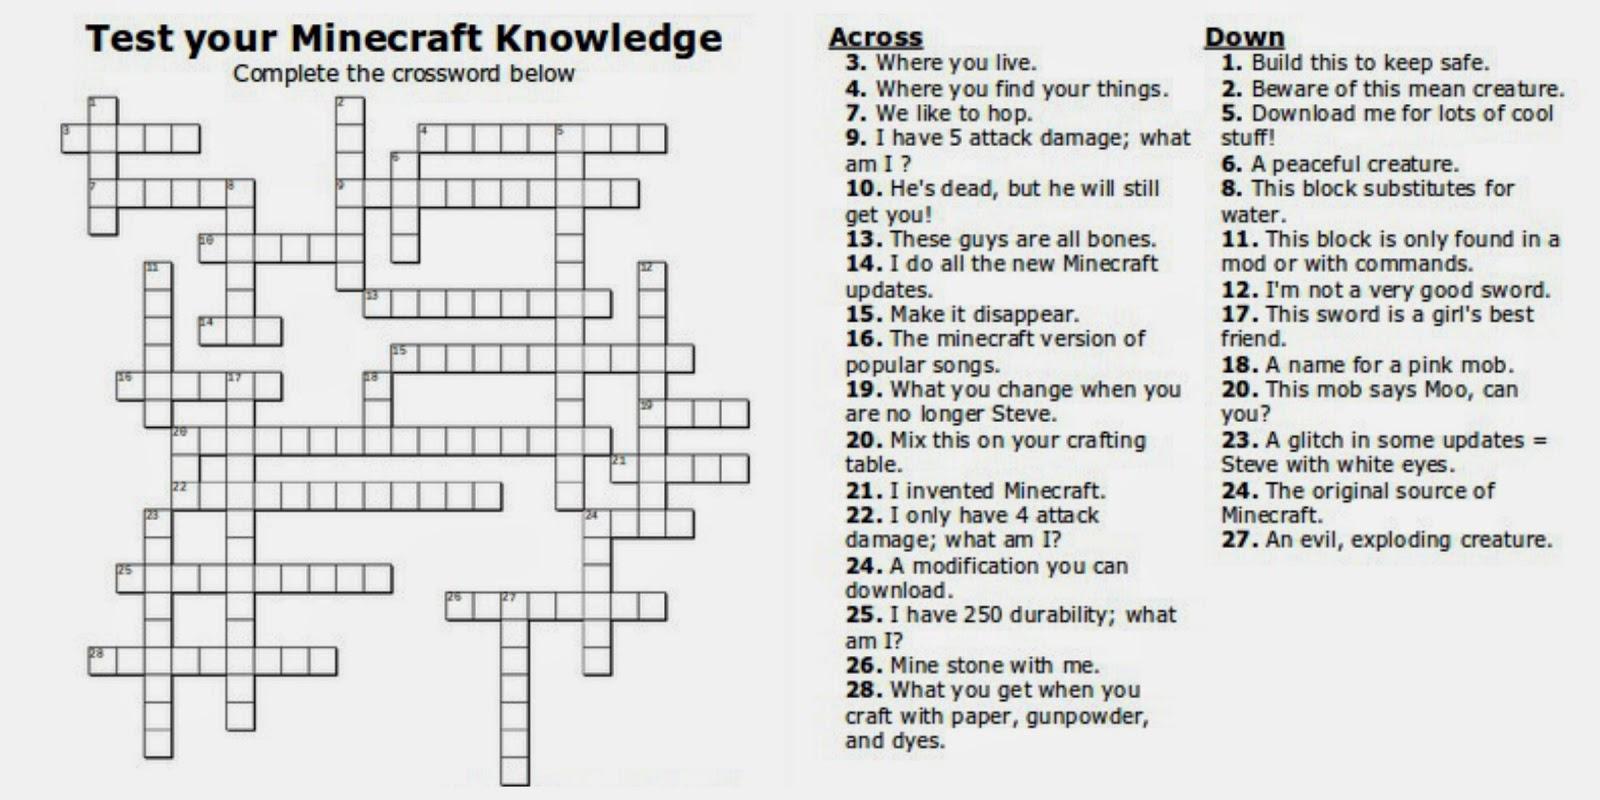 Free Printable Minecraft Crossword Search: Test Your Minecraft - Printable Crossword Puzzles For Teens